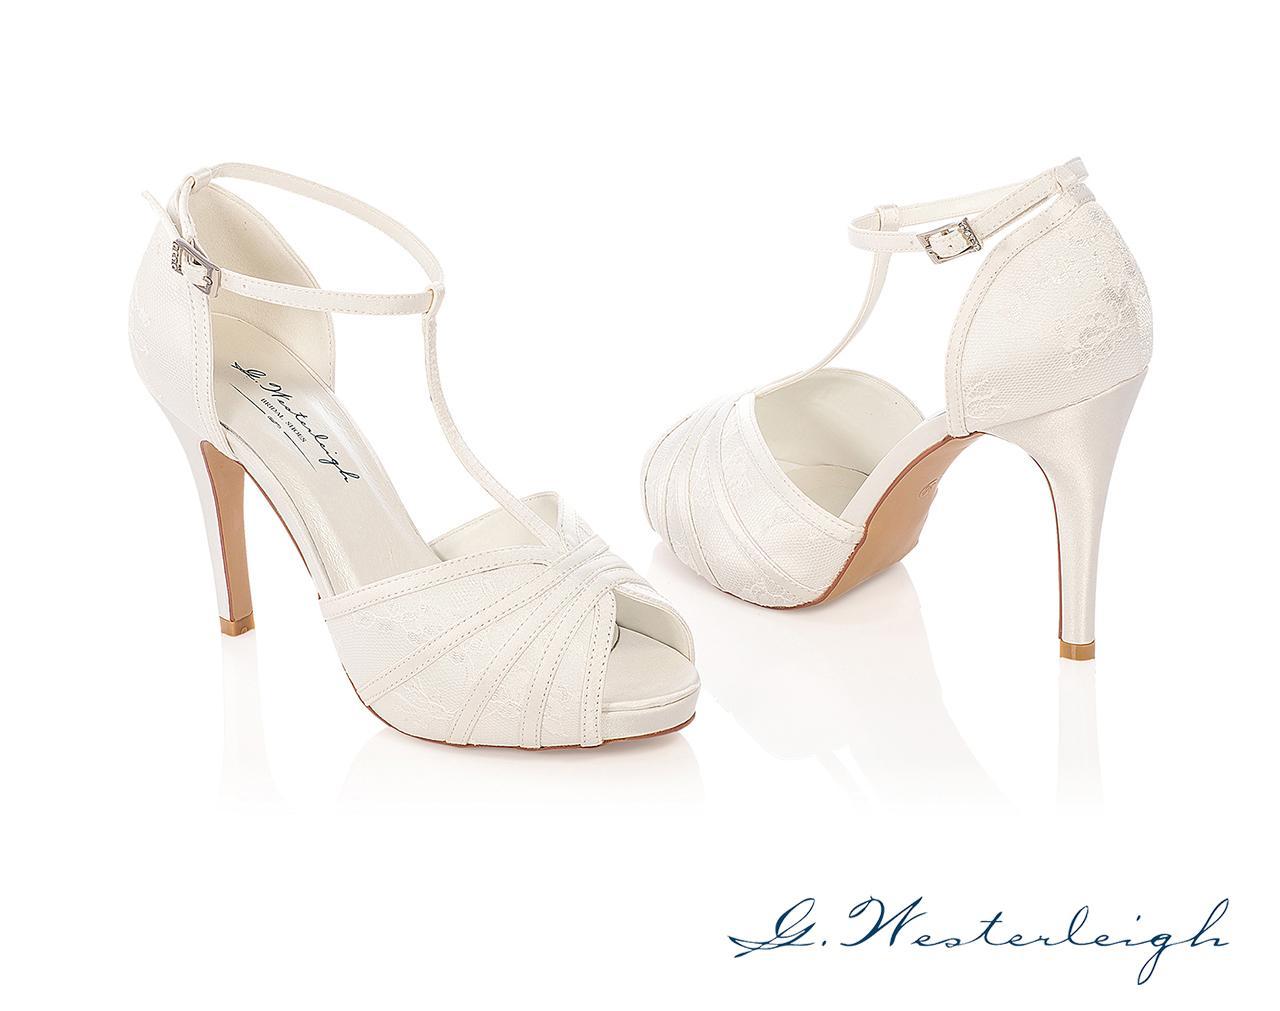 Svadobné topánky Scarlett - Obrázok č. 1